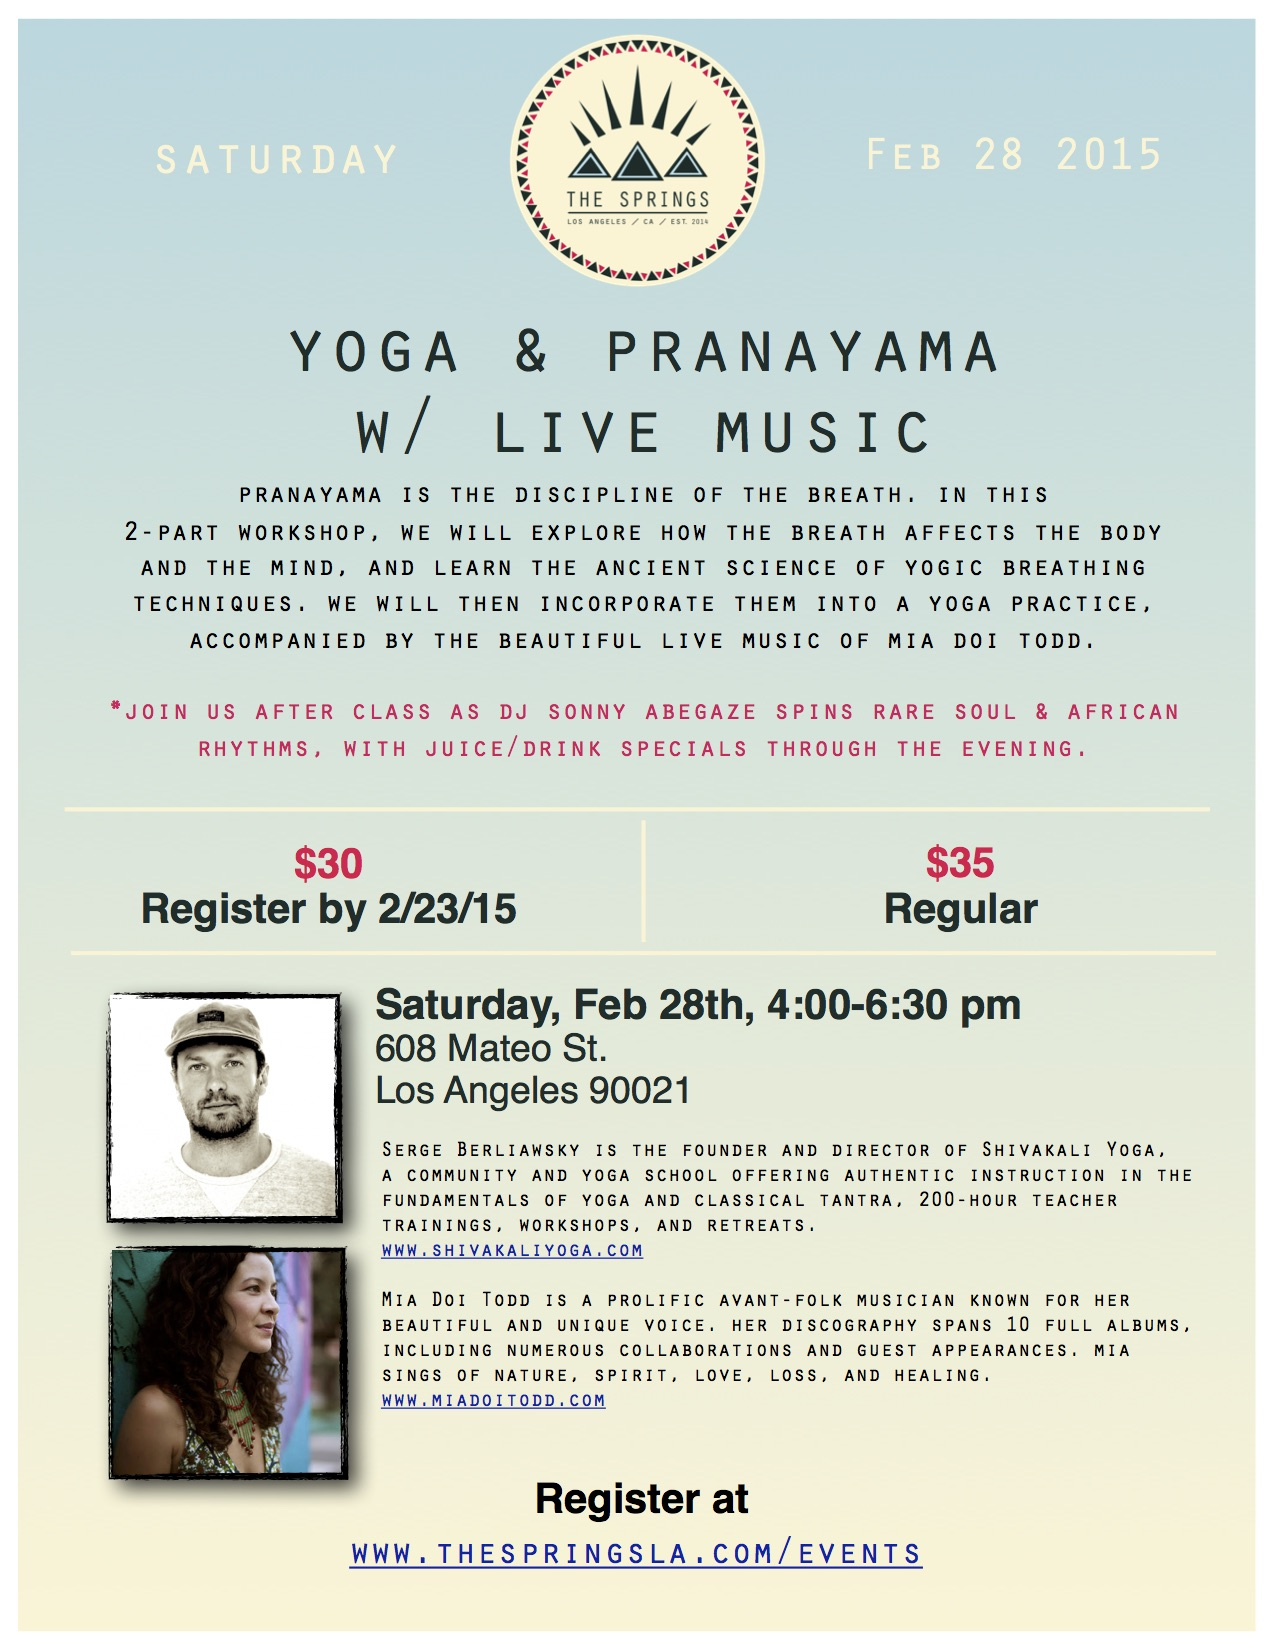 Yoga Workshop Mia Doi Todd + by Shivakali Yoga, a  Los Angeles-based Yoga Teacher Training and Yoga Certification School that holds Yoga Retreats and Workshops.